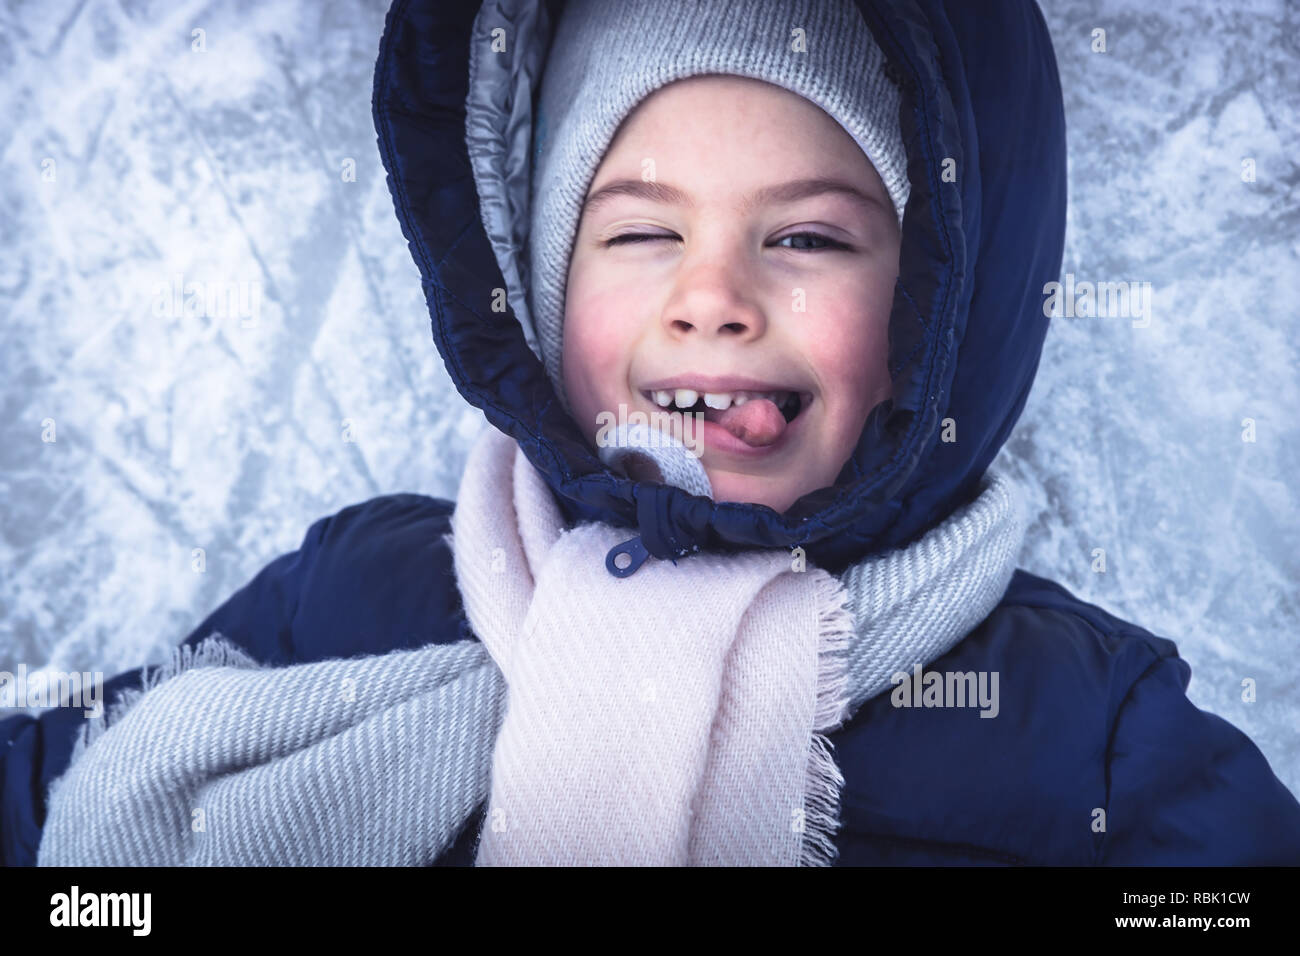 6ebfee84f Winter cheerful child portrait on snow ice background having fun on ...